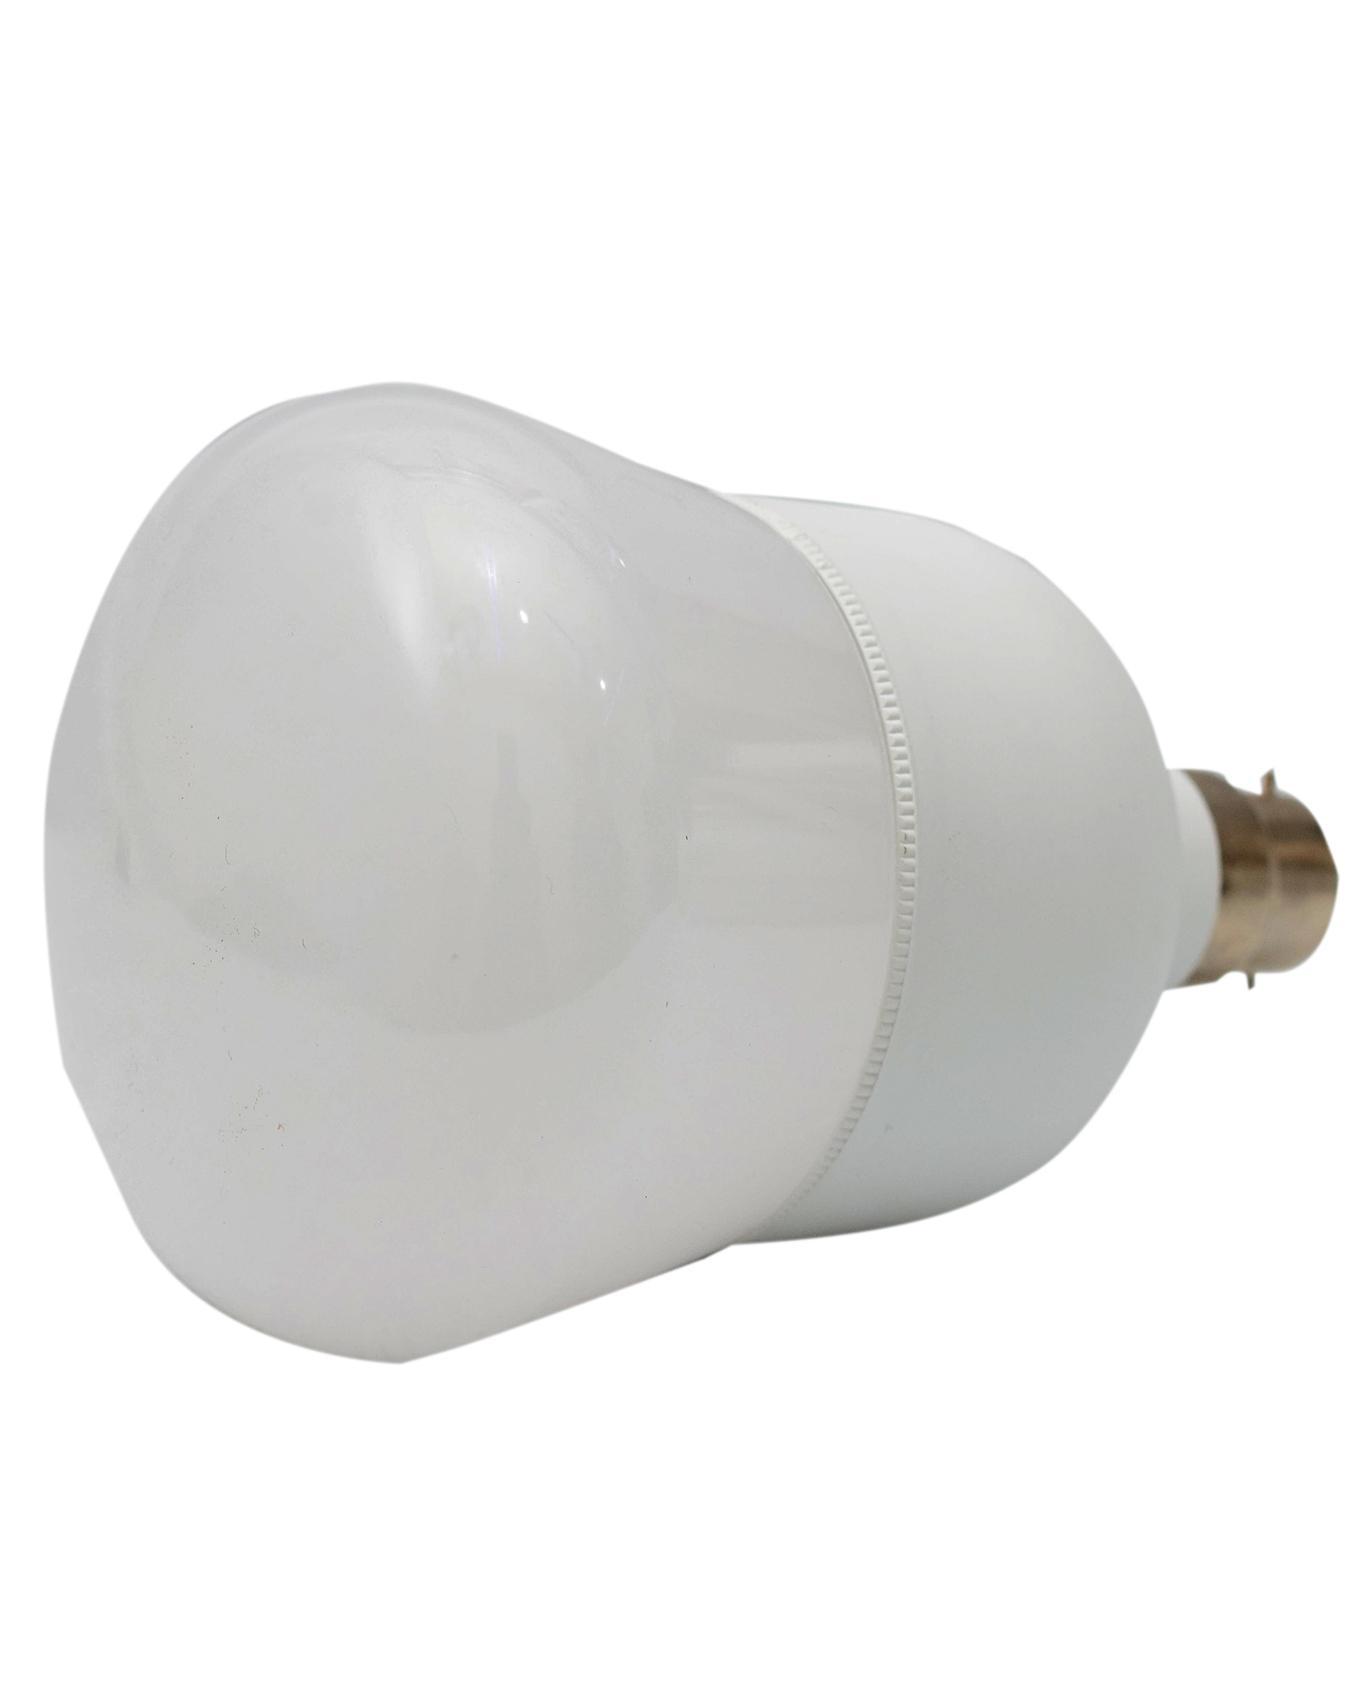 AIKO Super LED Bulb 20W